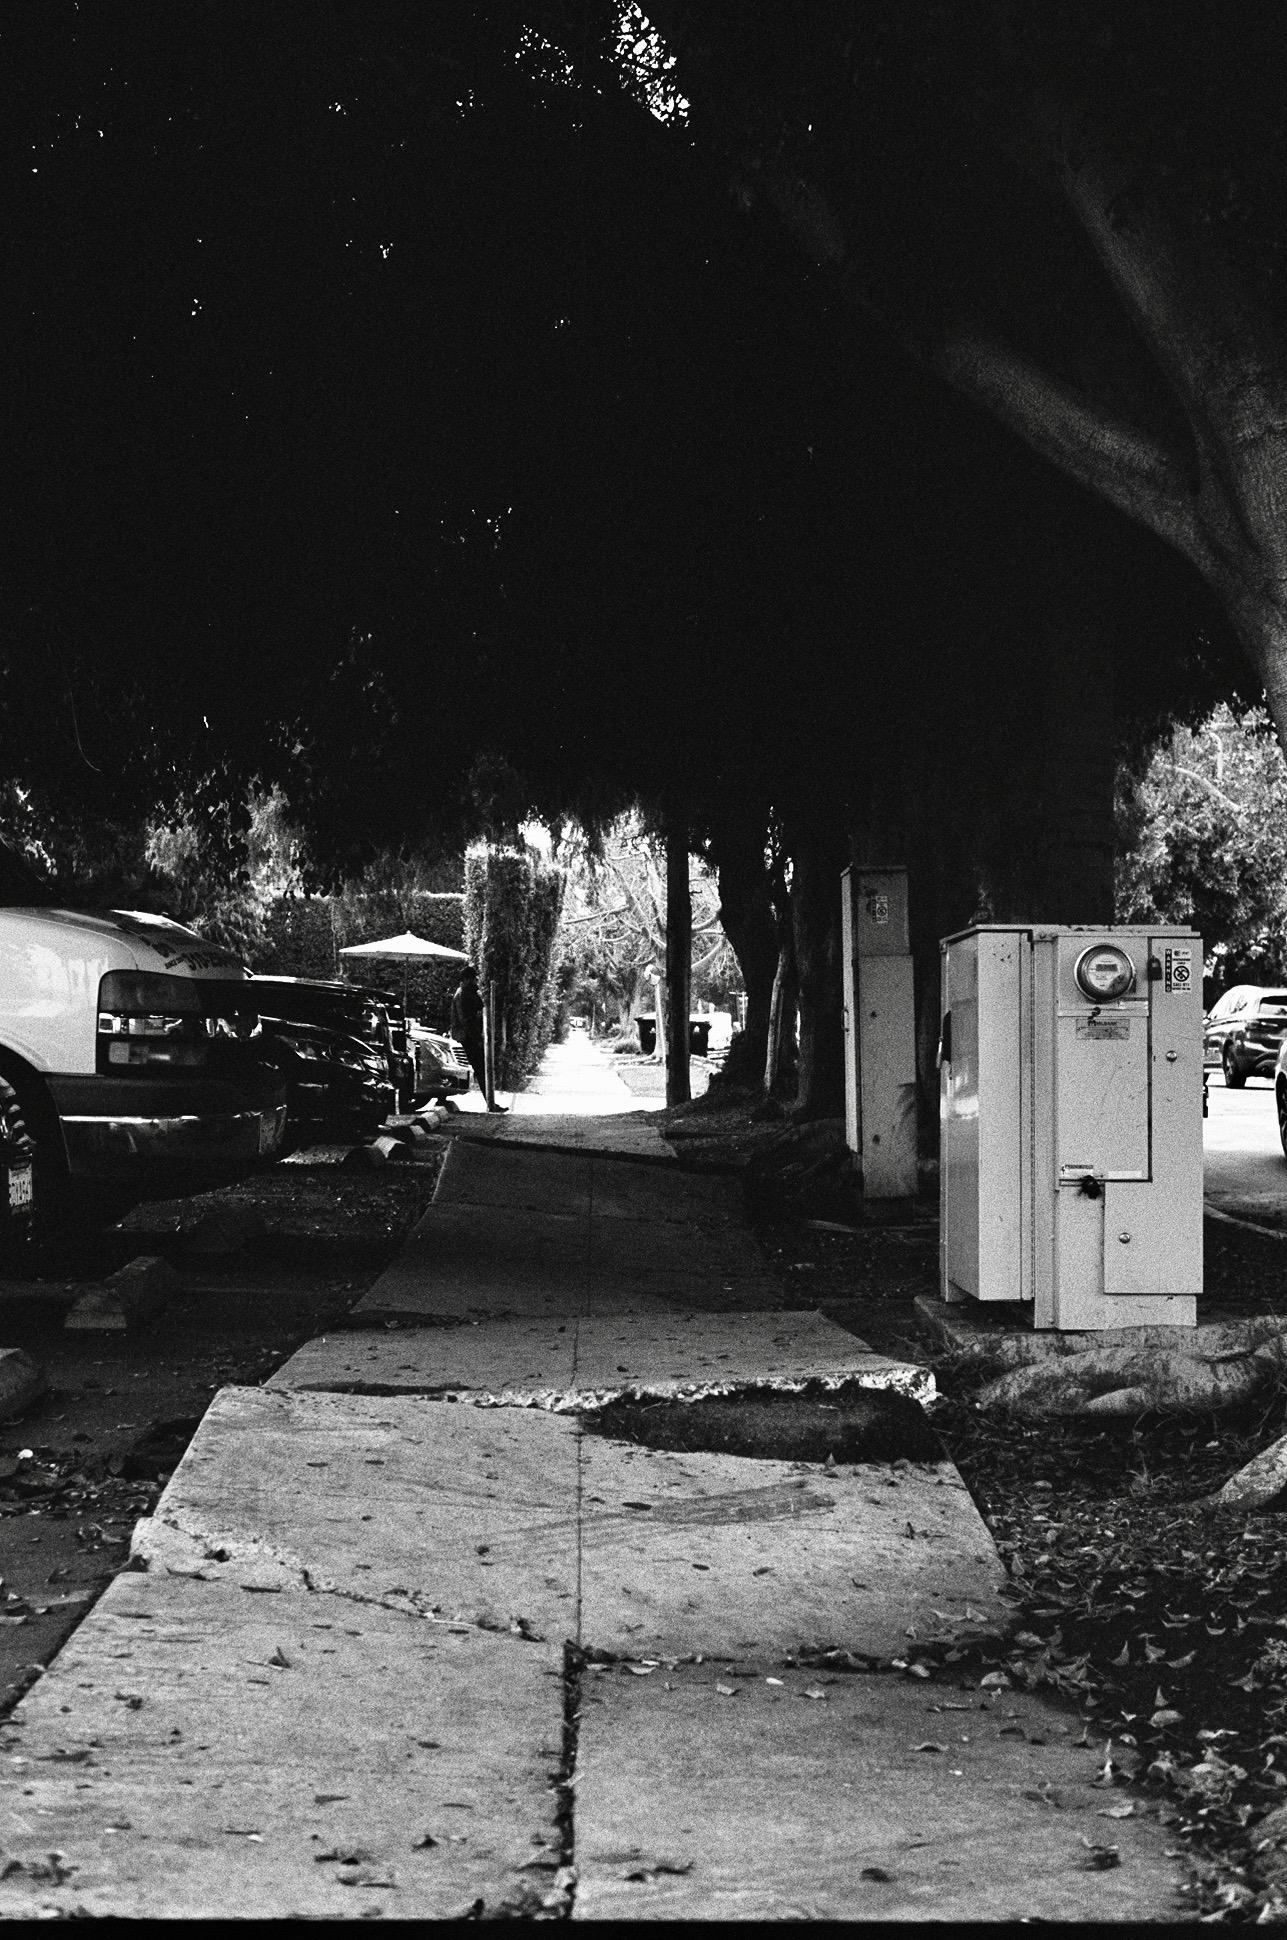 Pico-Robertson, Los Angeles.  Kodak Tri-X 400. Pentax K1000. Fletcher Berryman 2019.